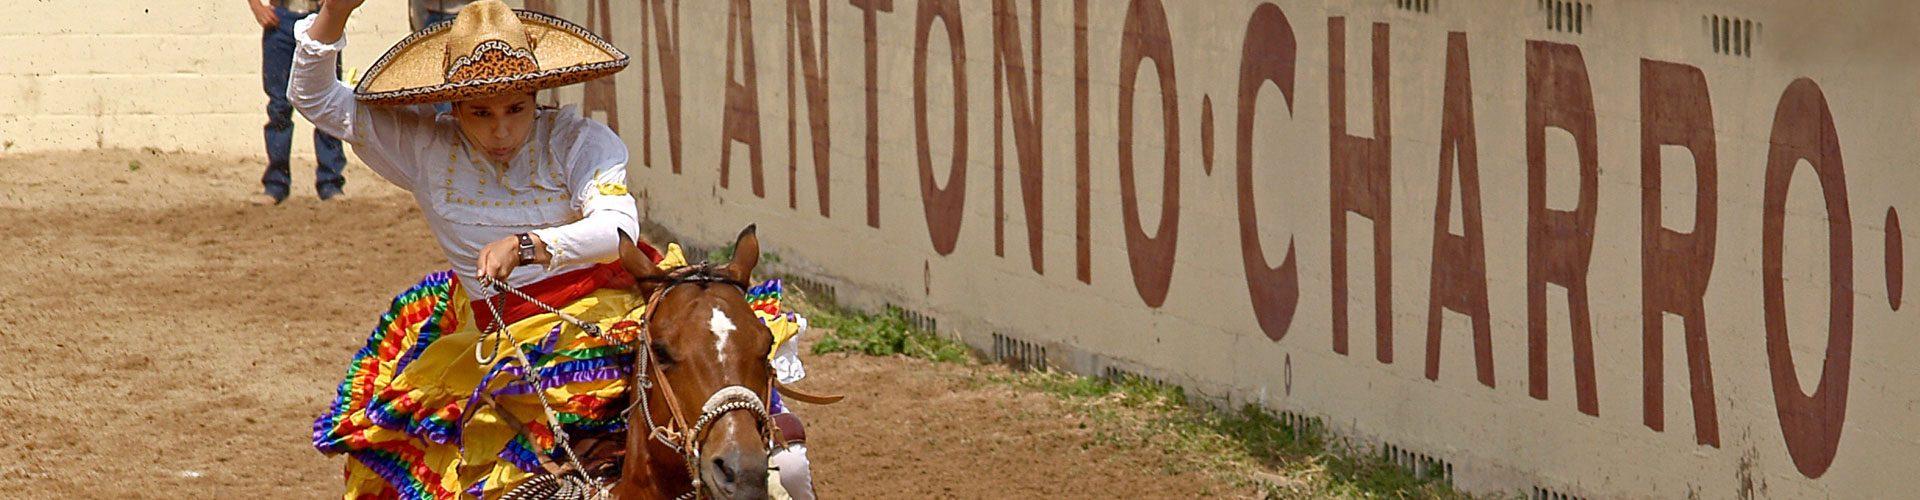 Rodeo Reiter in San Antonio, Texas